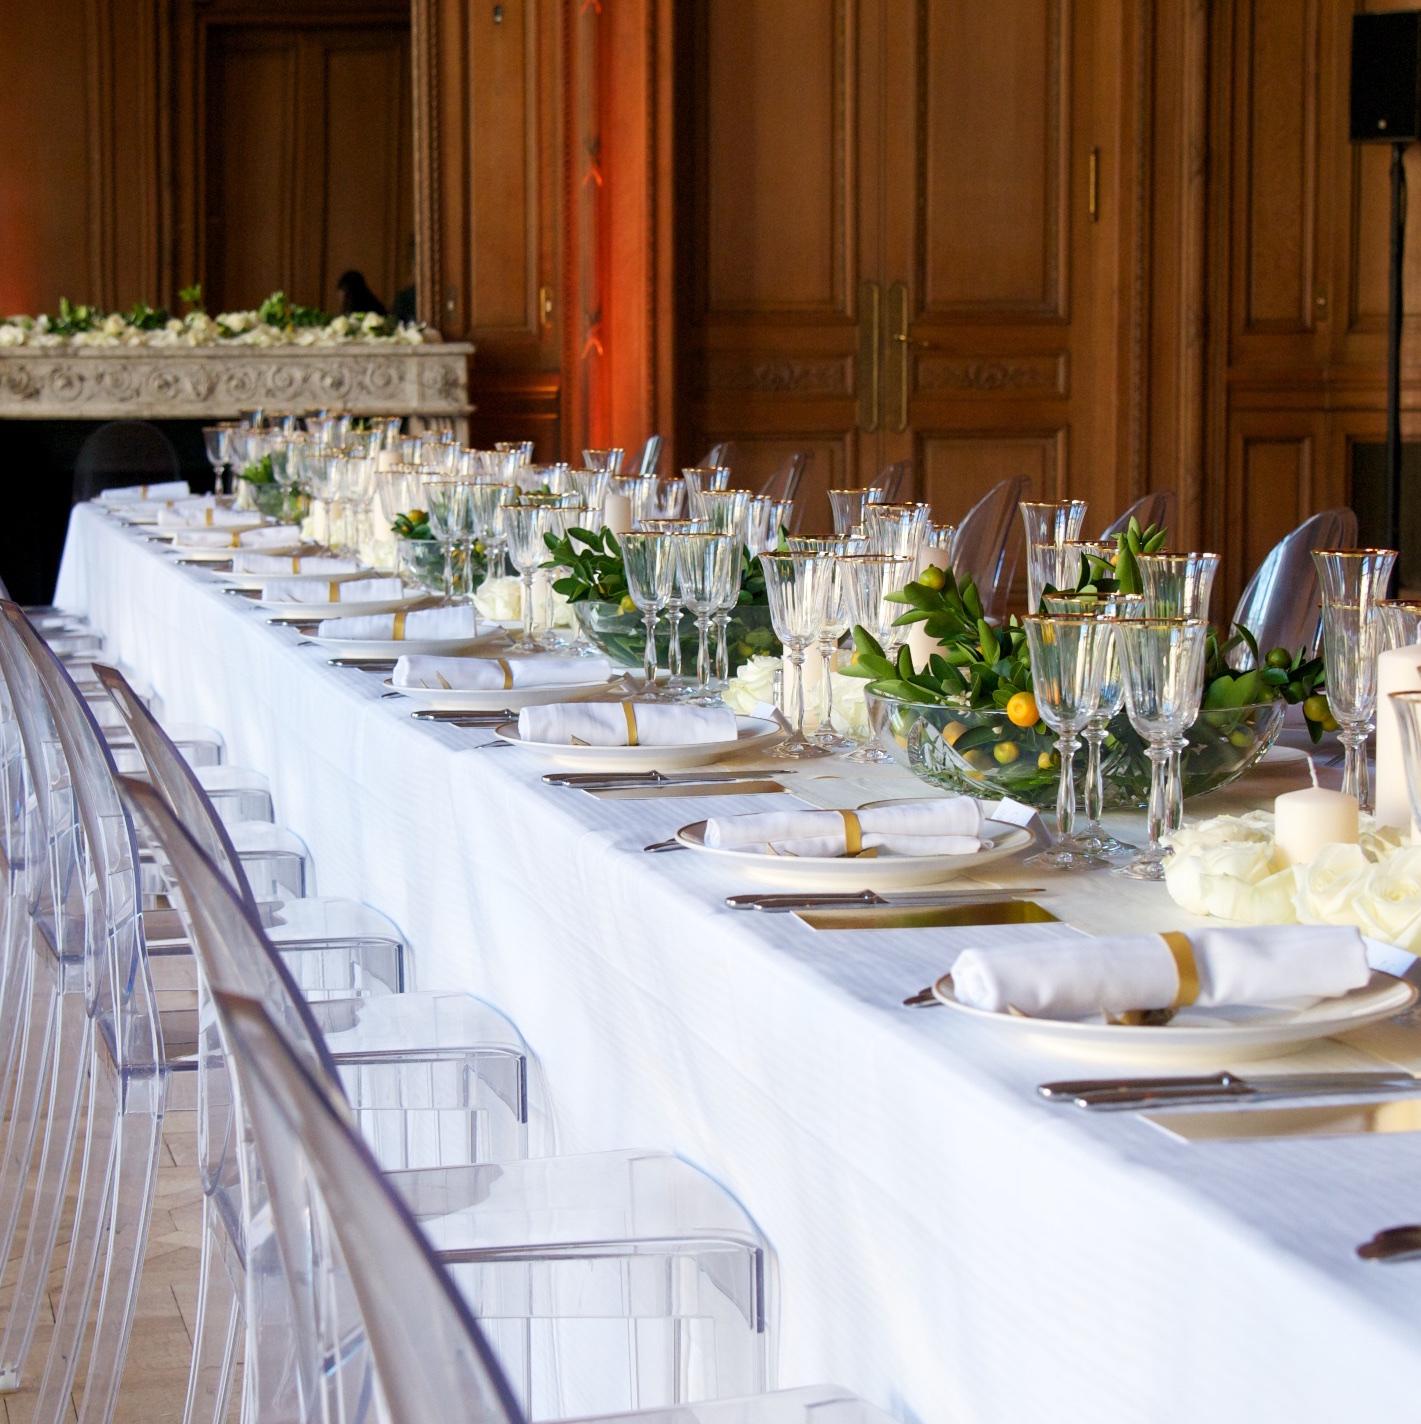 Christian Morel Fleuriste Paris - Mariage - Table de mariage